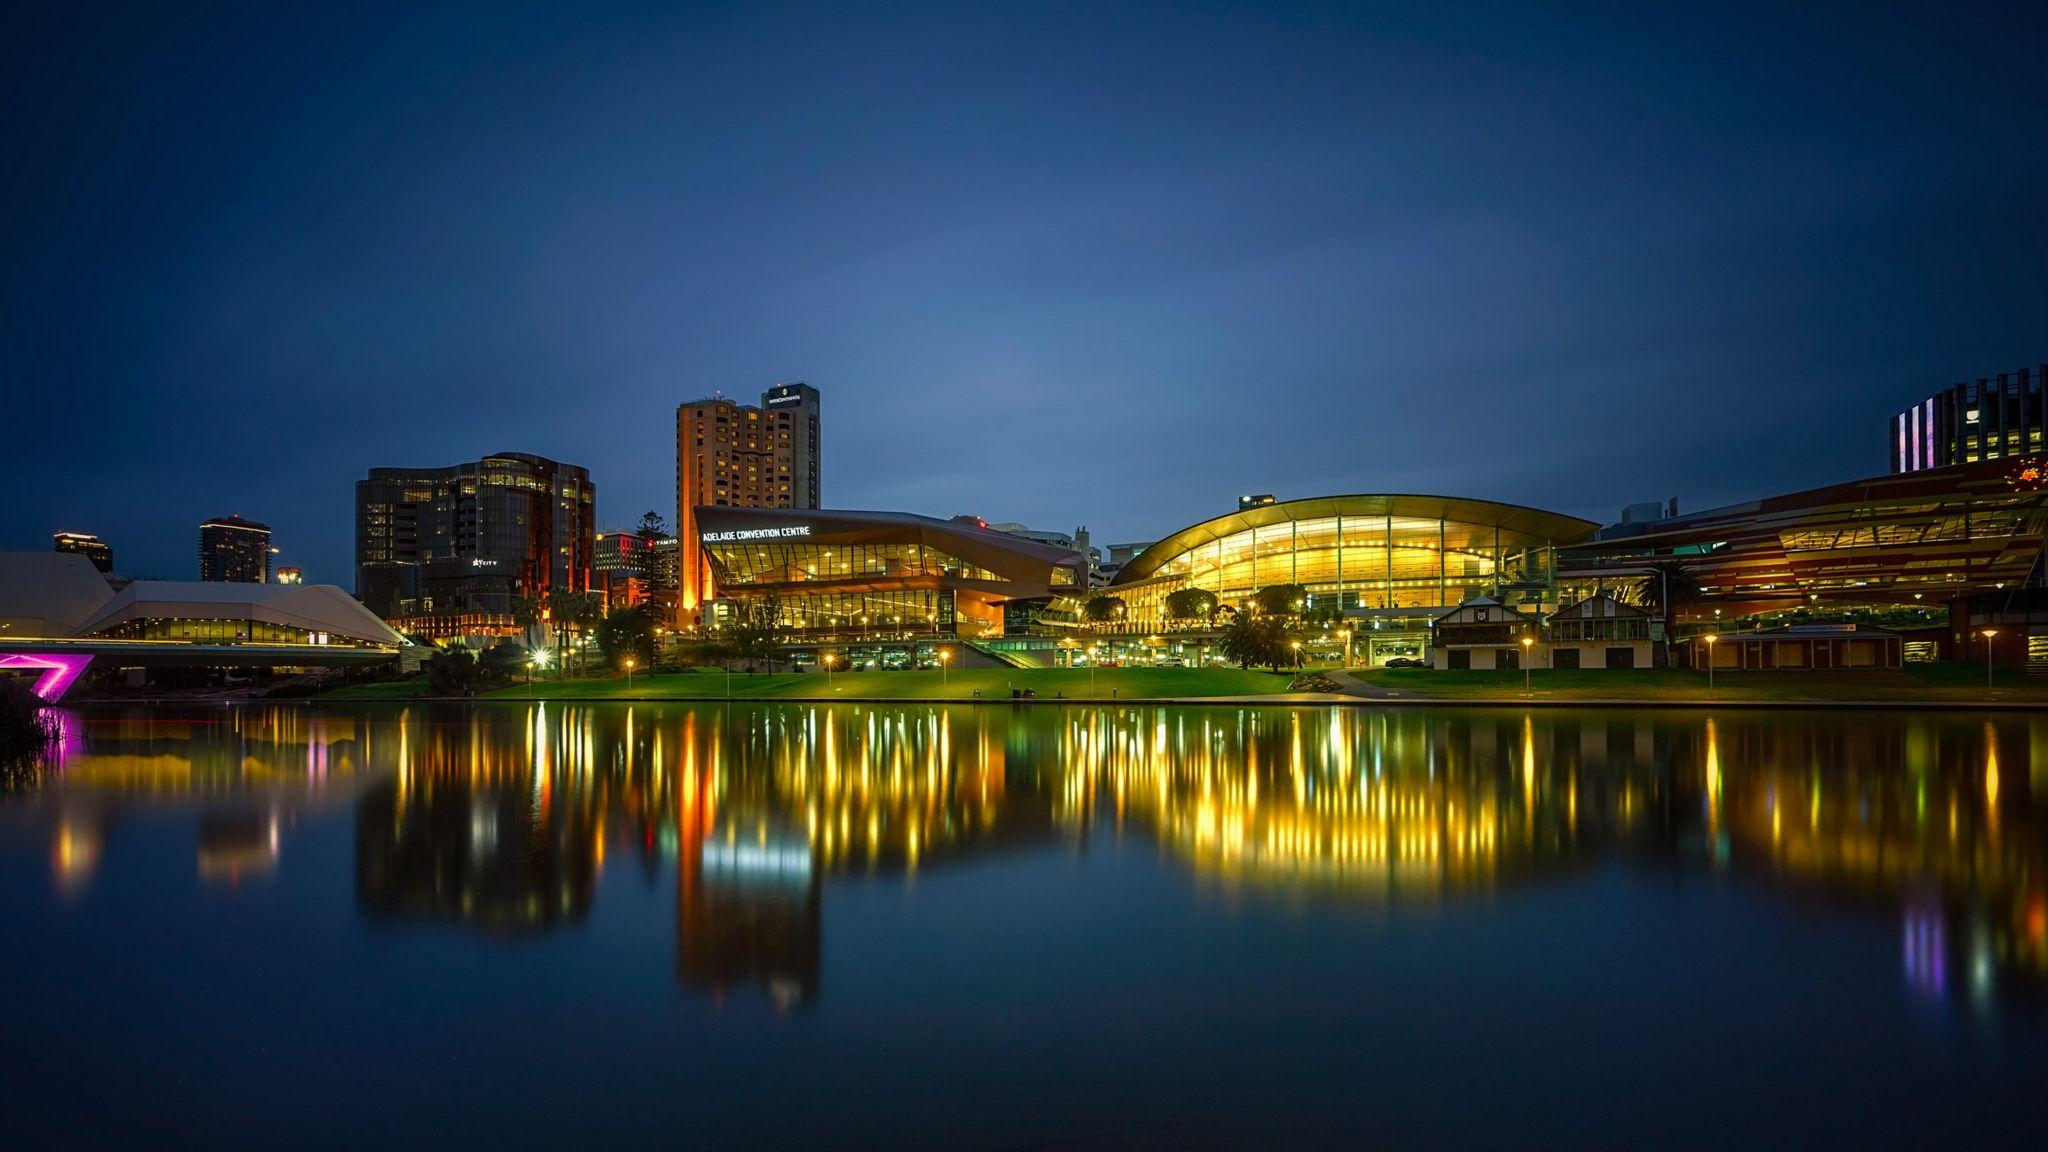 SkyCity casino Adelaide